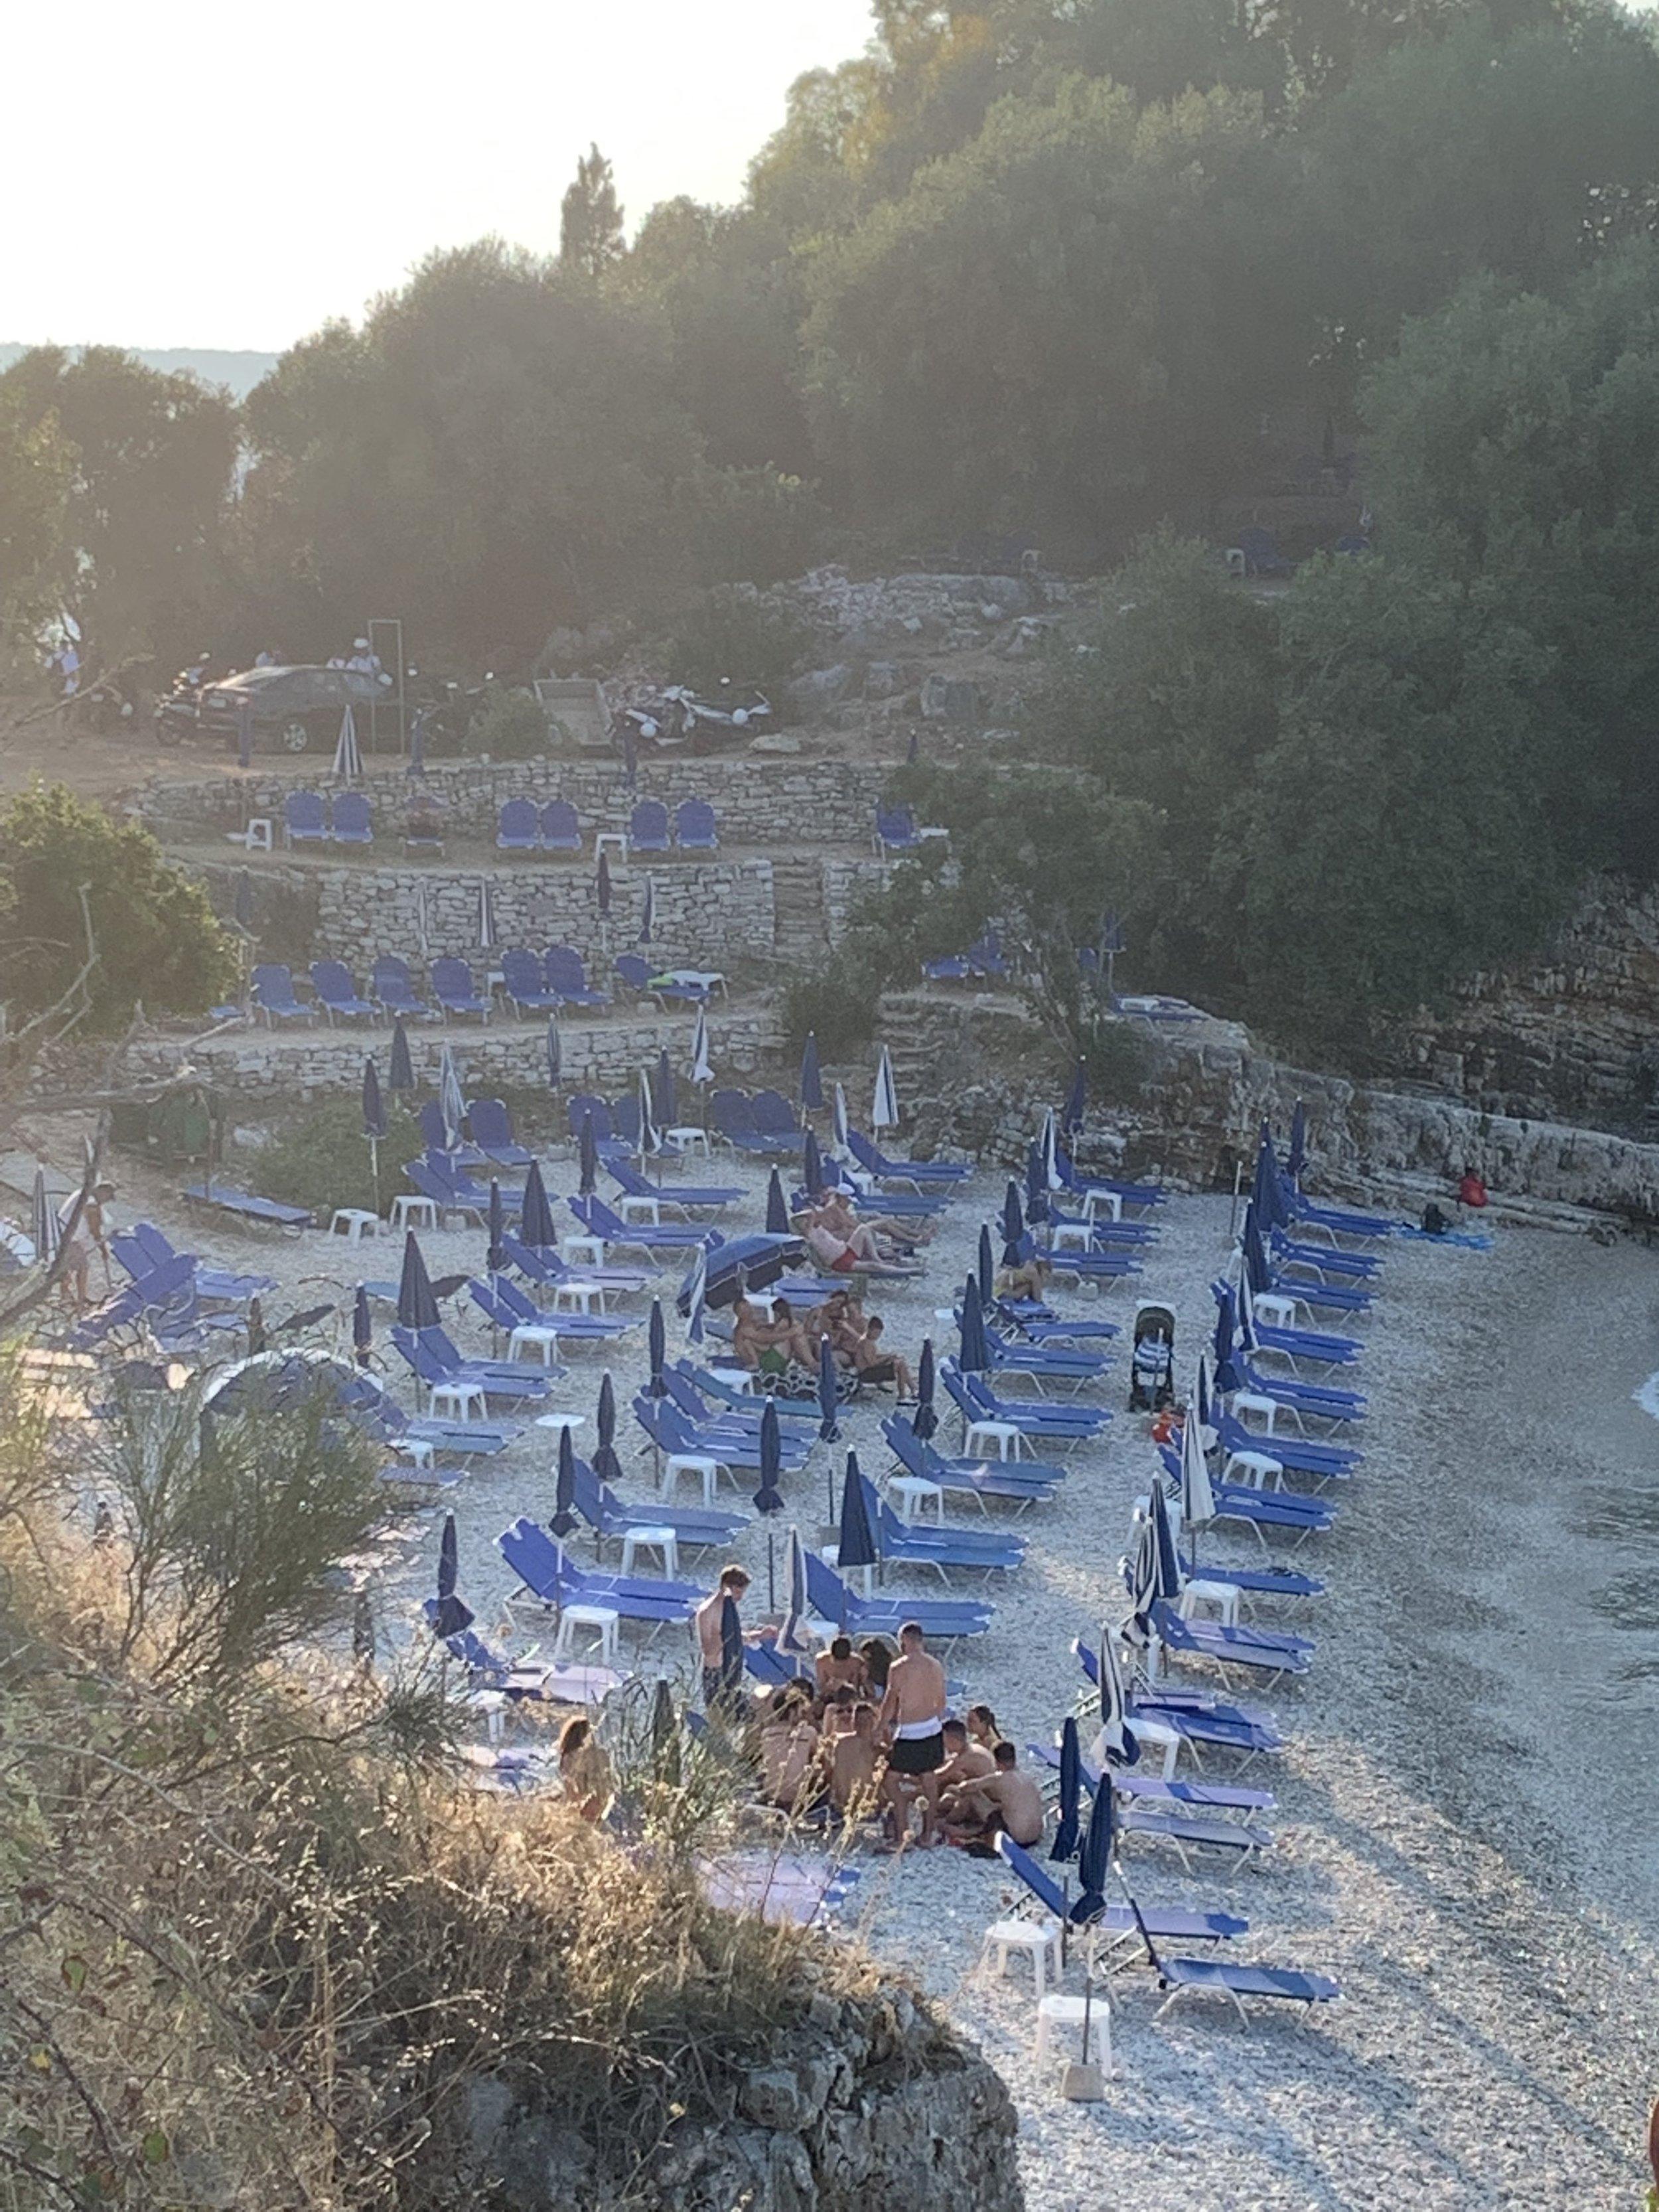 Bataria Beach, ten minutes from villa.